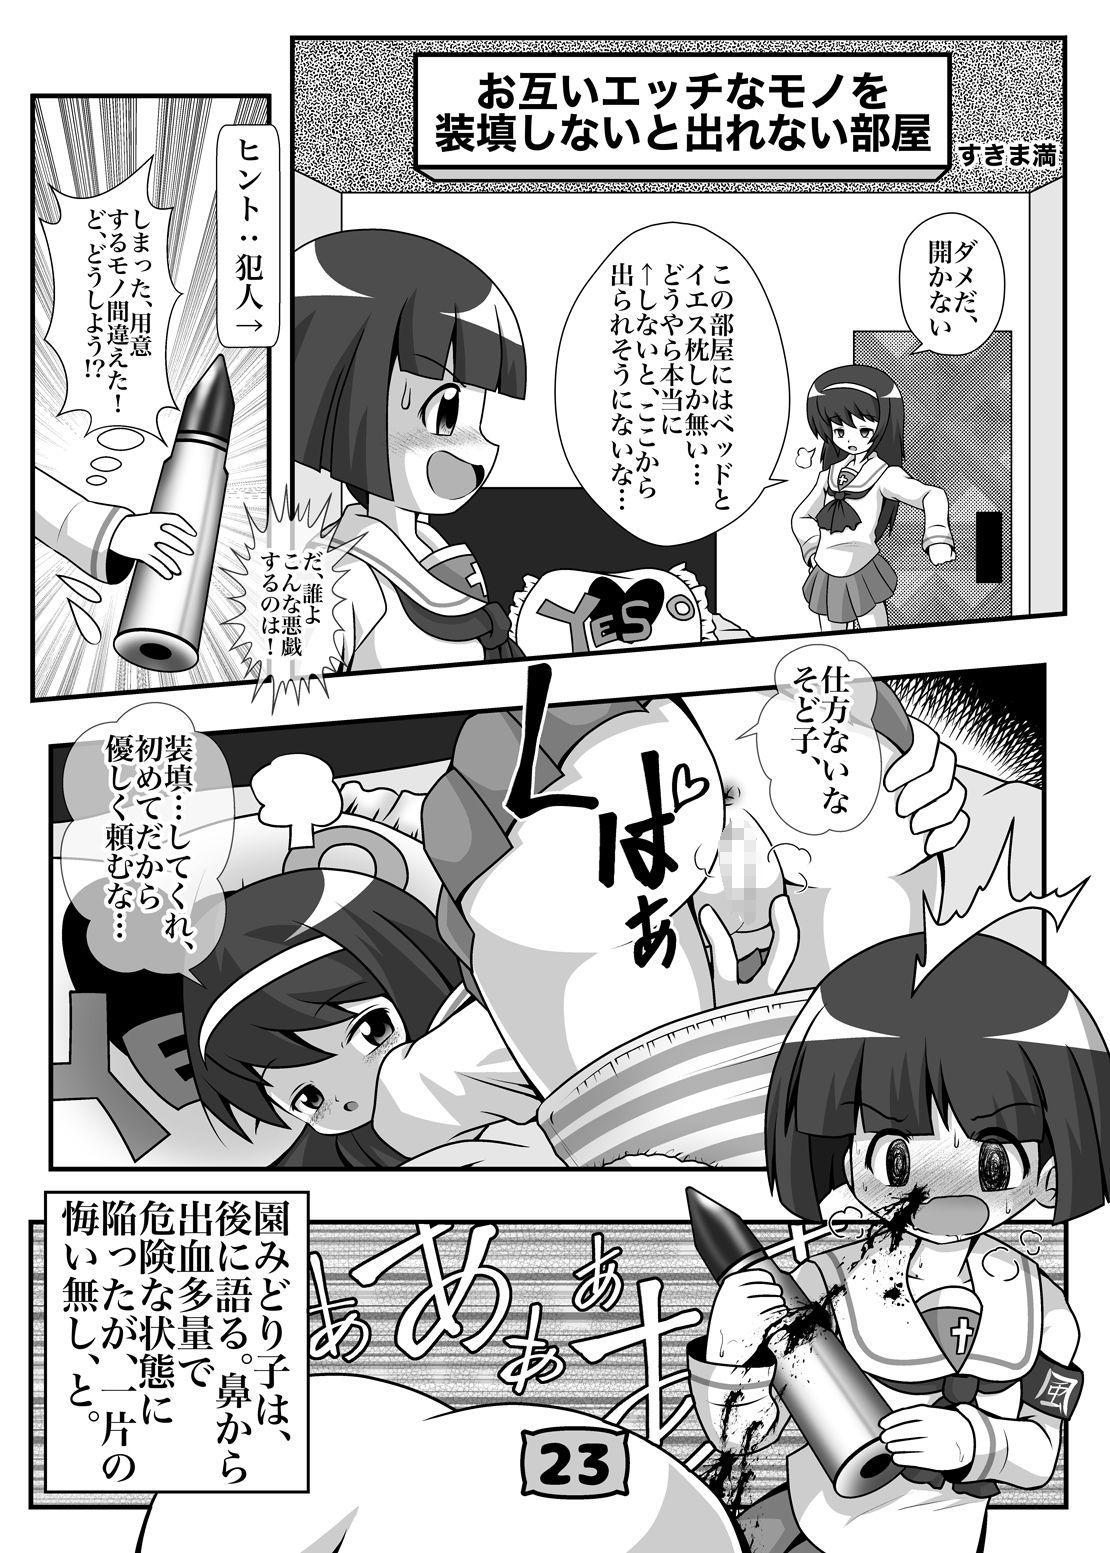 GirlPan YES/NO Makura Goudoushi 18